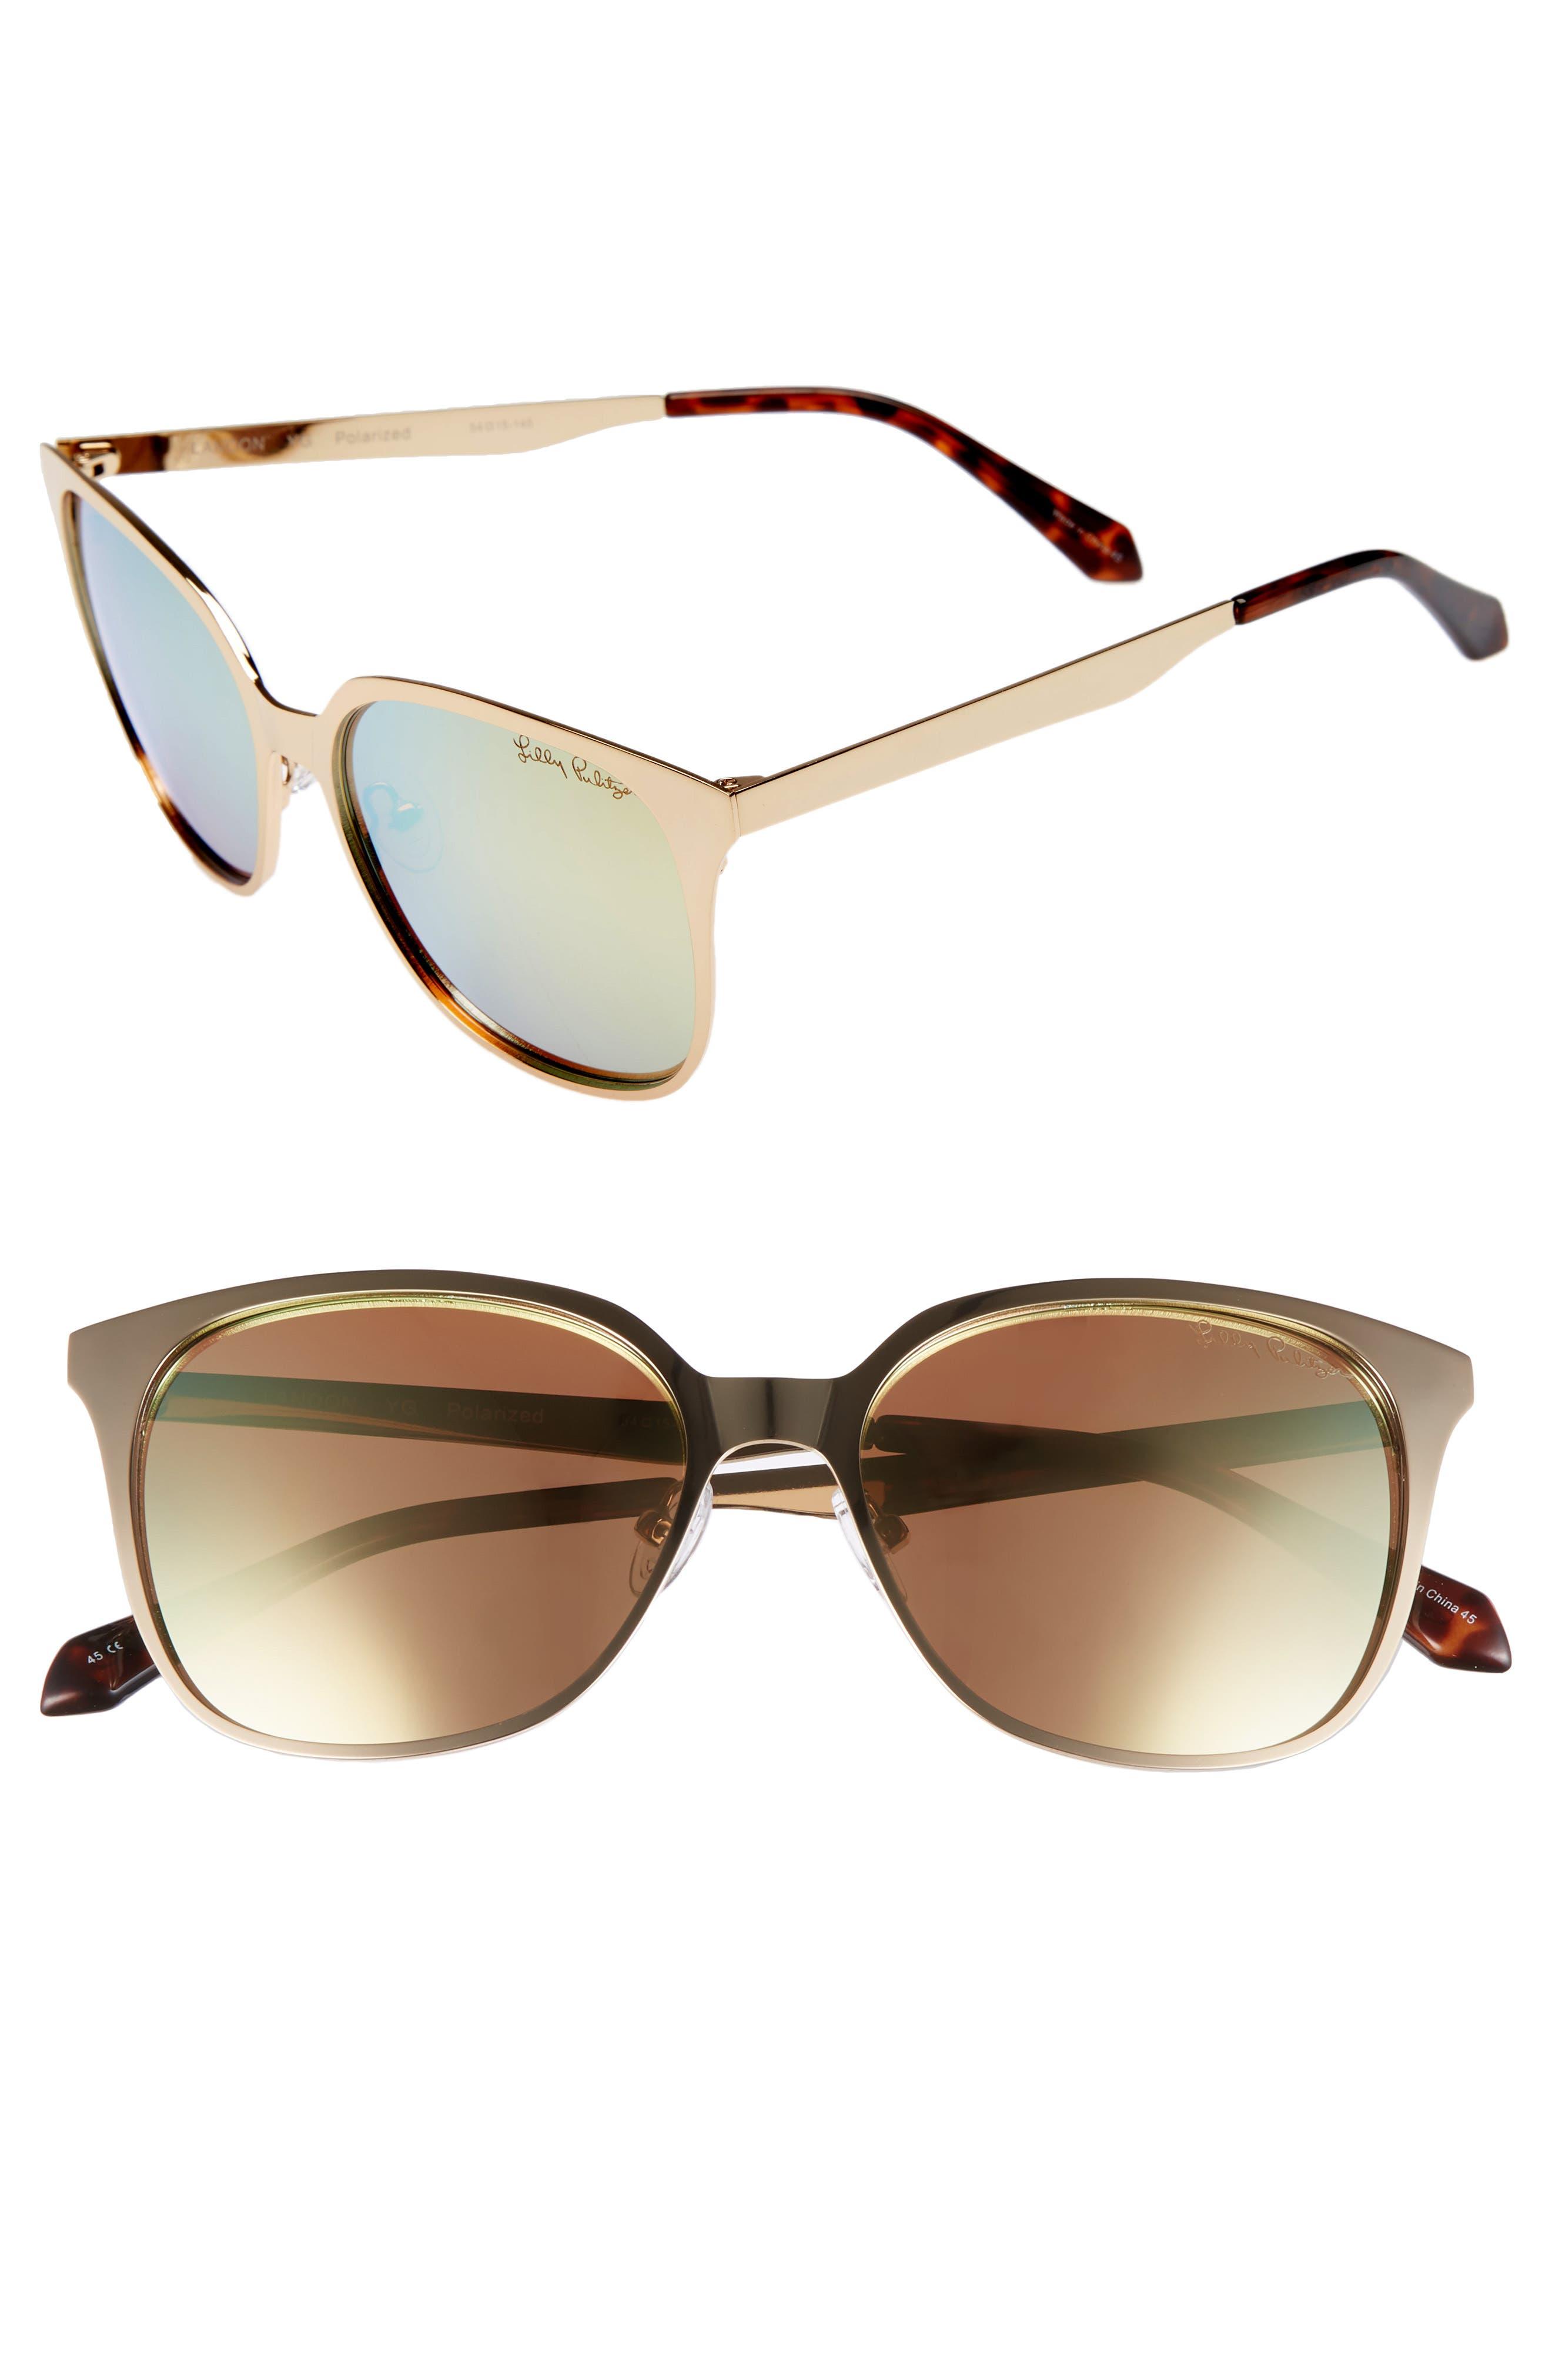 Lilly Pulitzer Landon 5m Polarized Sunglasses - Gold/ Gold